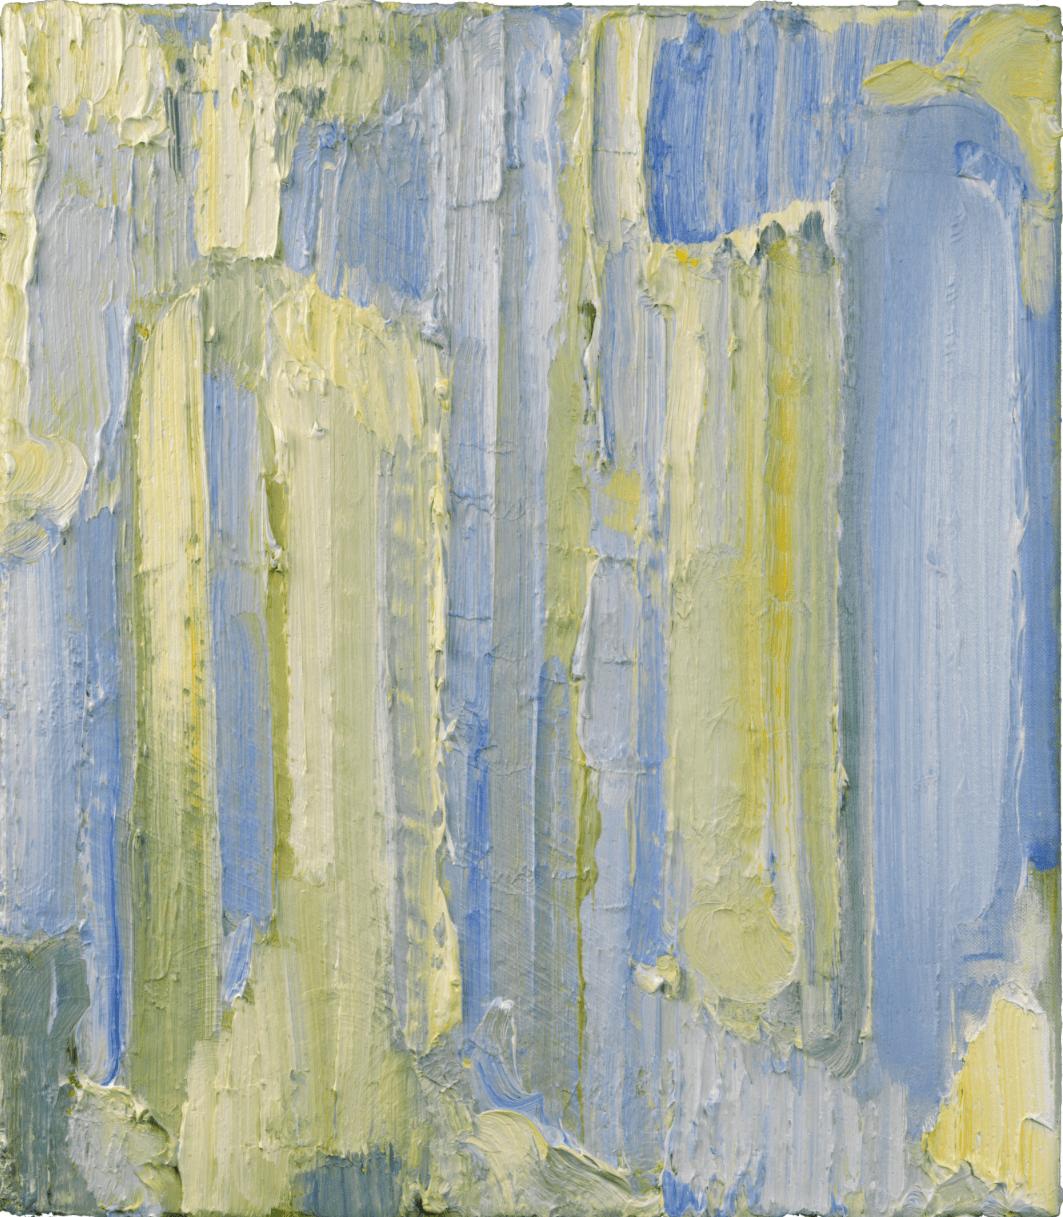 Lichaam, oil on canvas 40x30cm, 2016-17